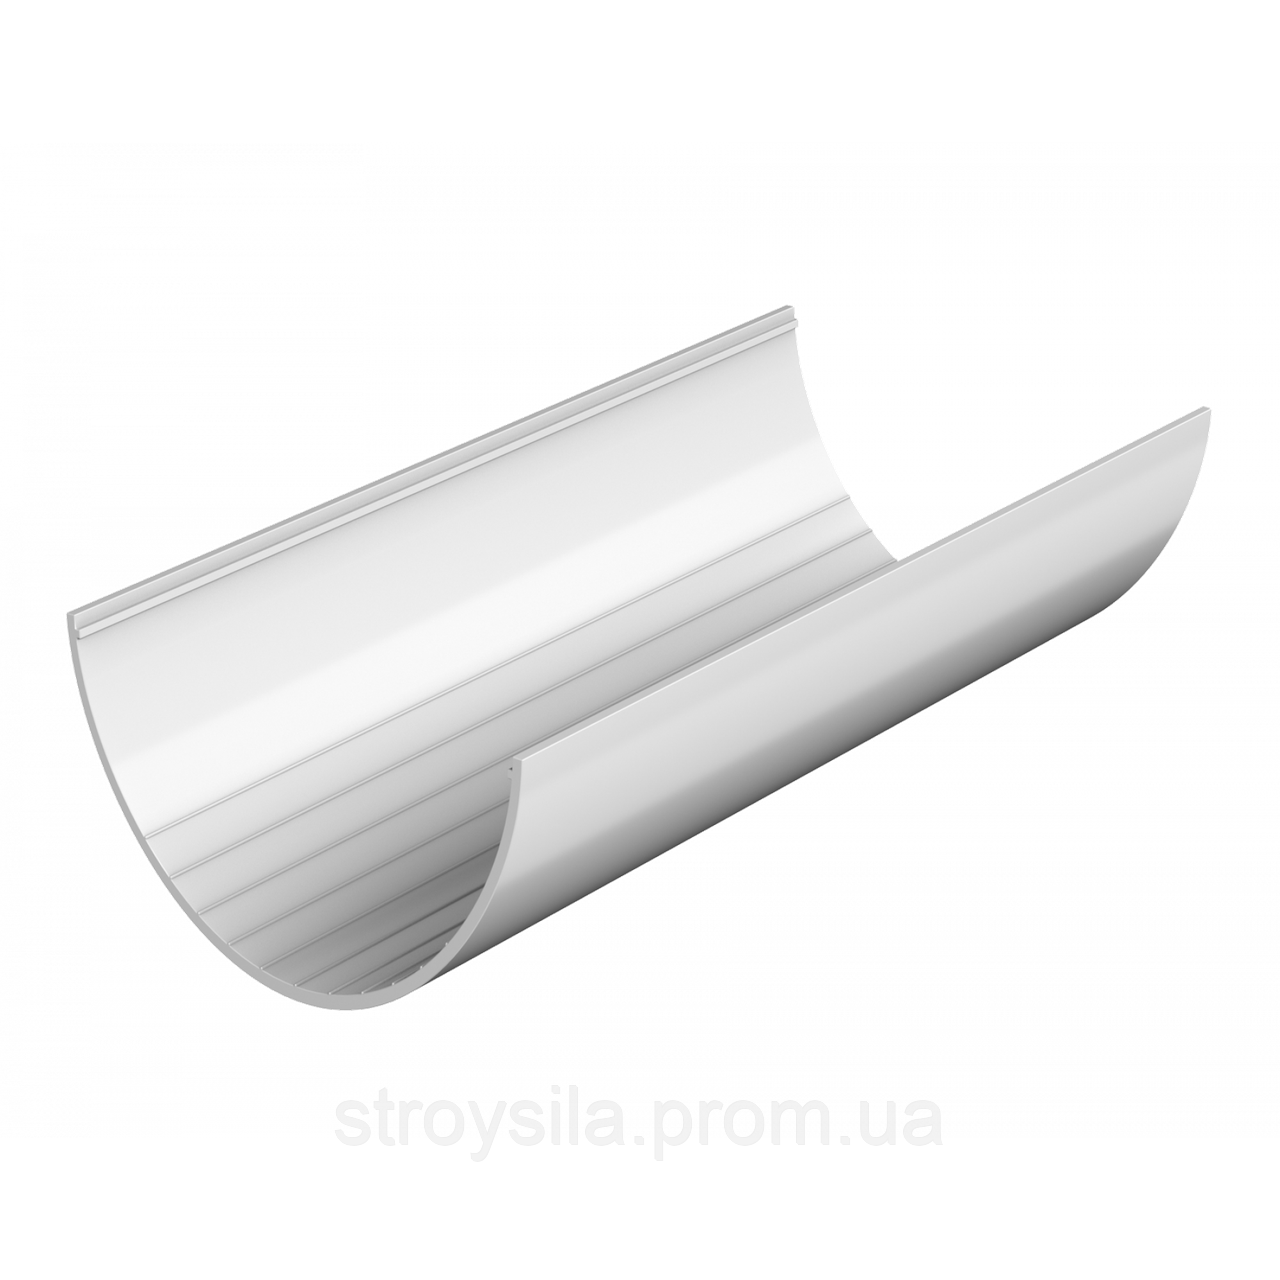 Желоб Технониколь 3м, Белый ПВХ